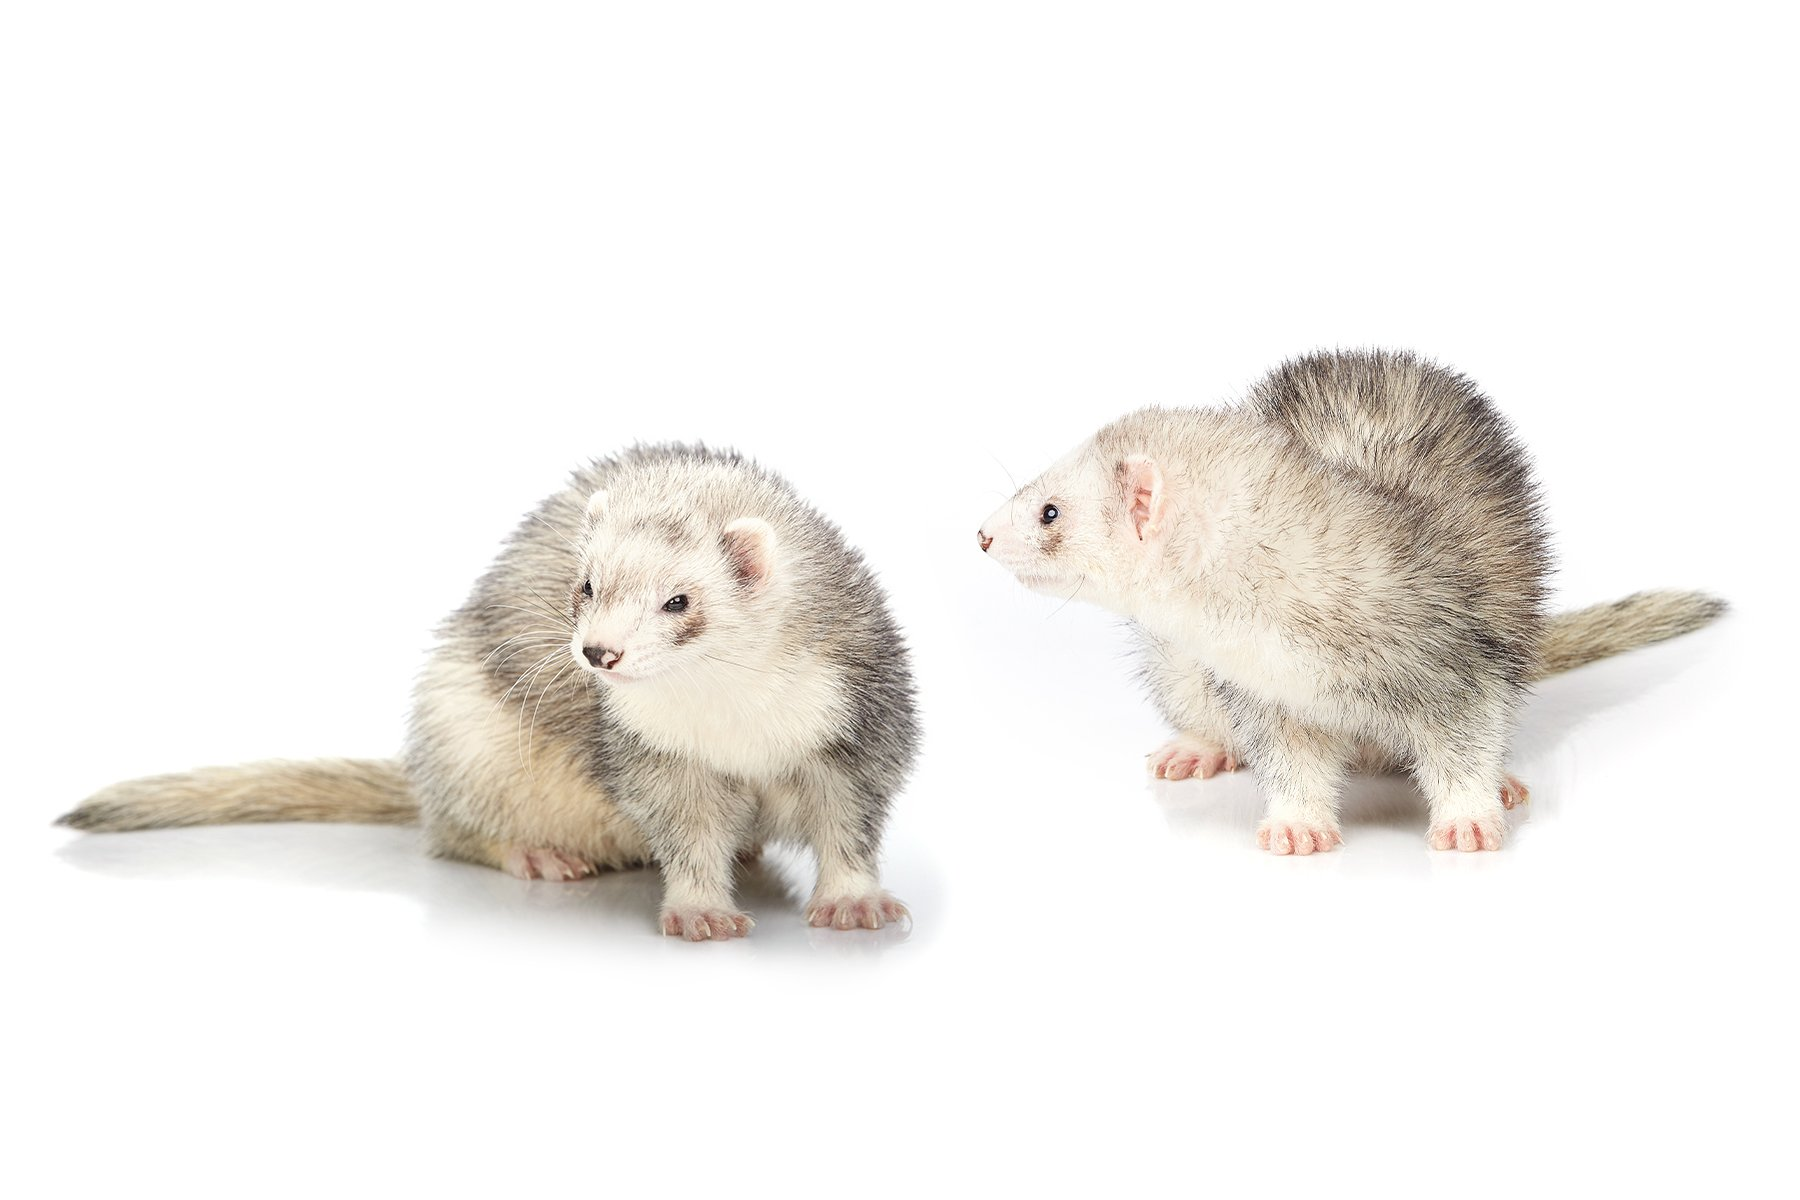 Two silver-mitt ferrets